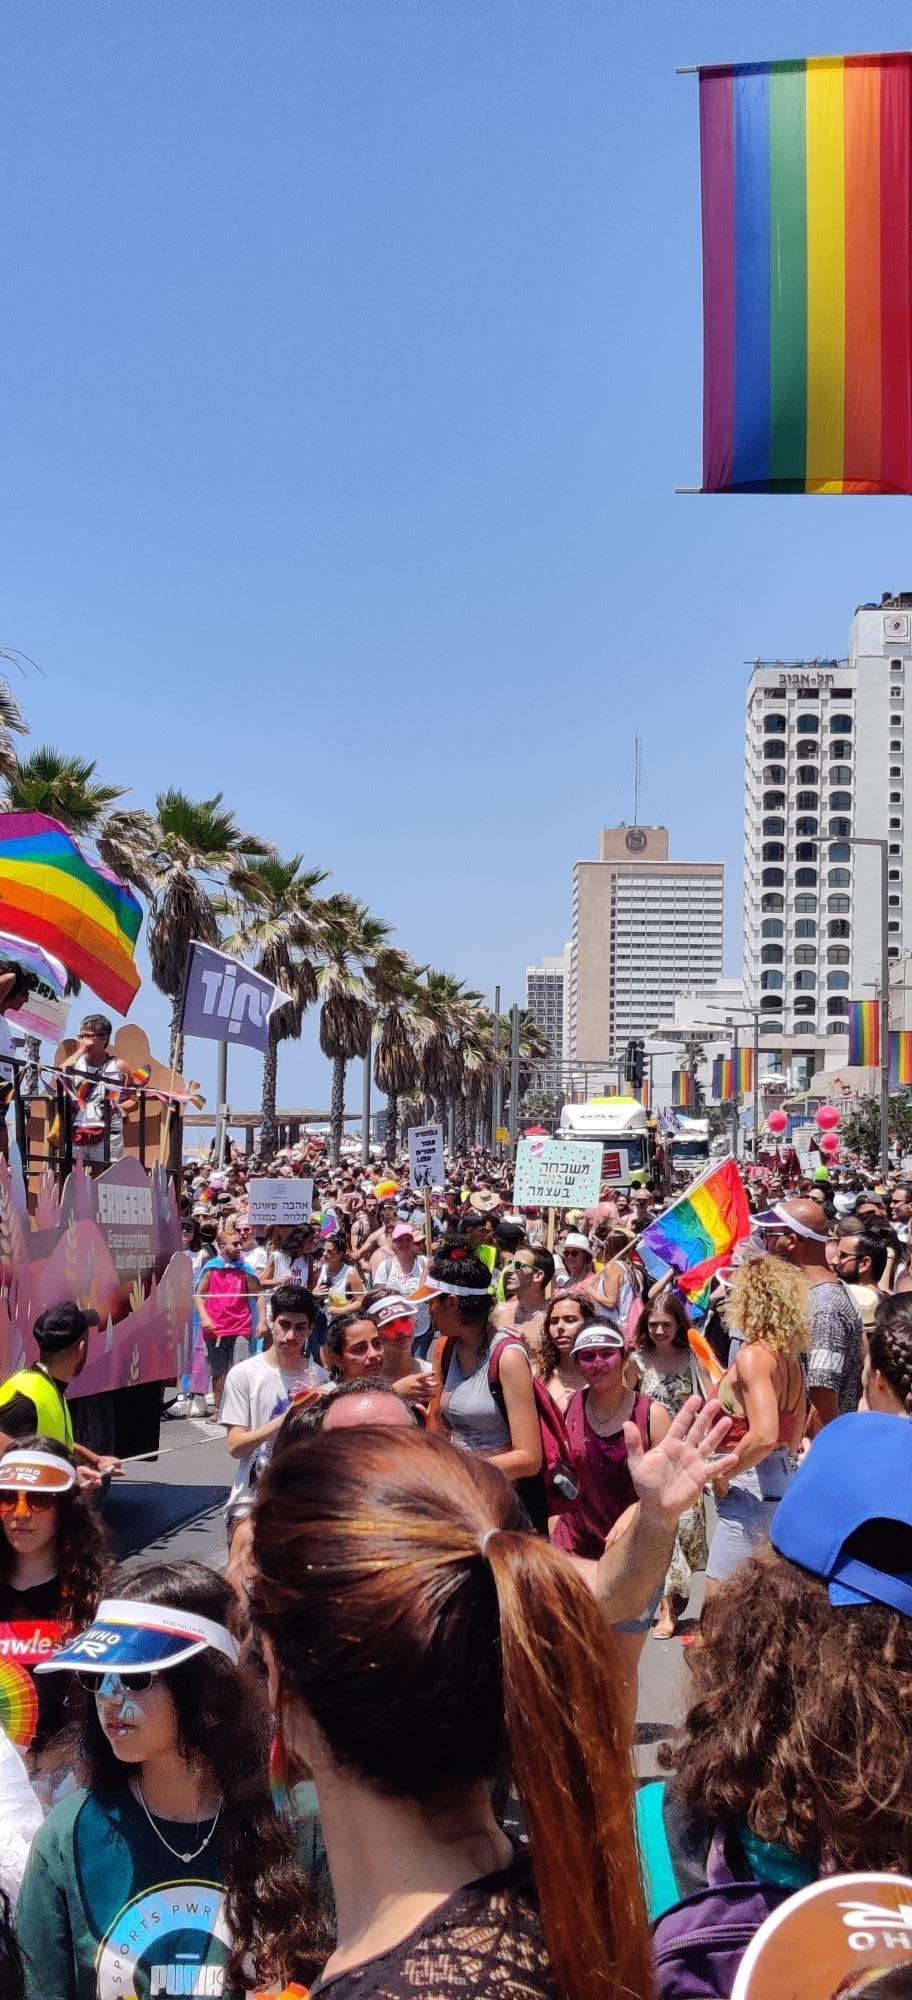 Tel Aviv Pride Parade 2019